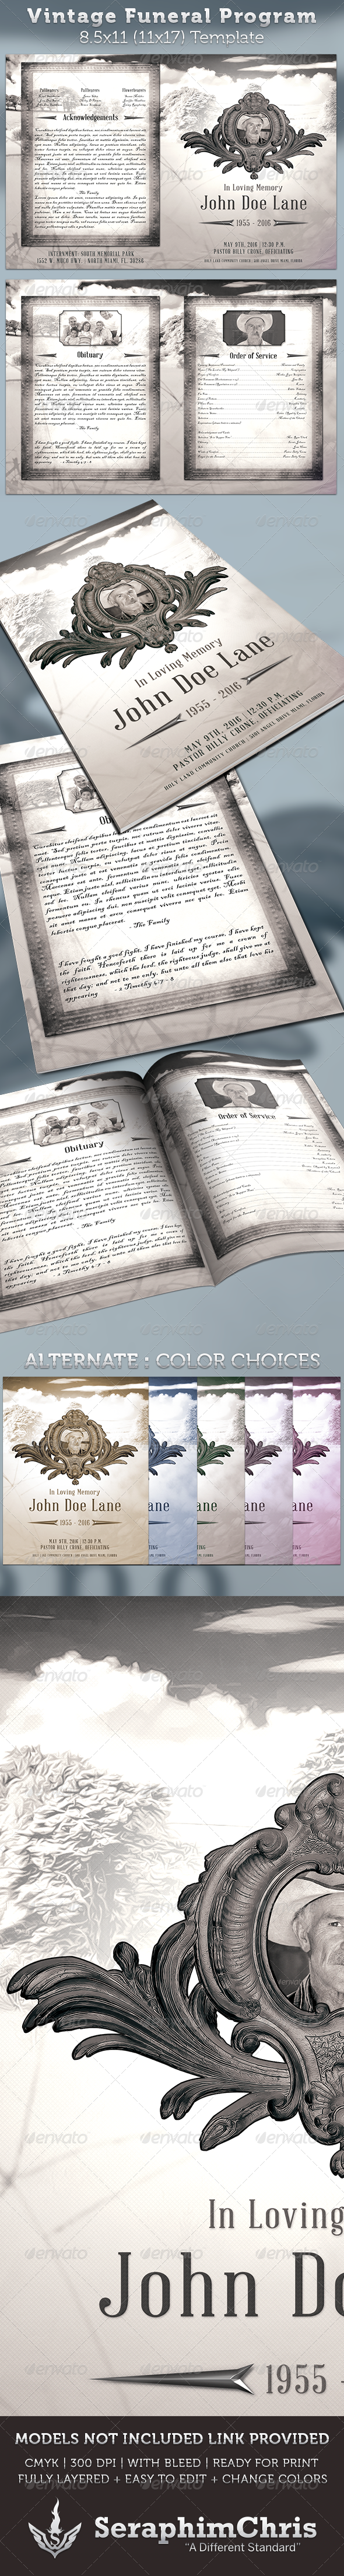 Vintage Funeral Program Template - Informational Brochures